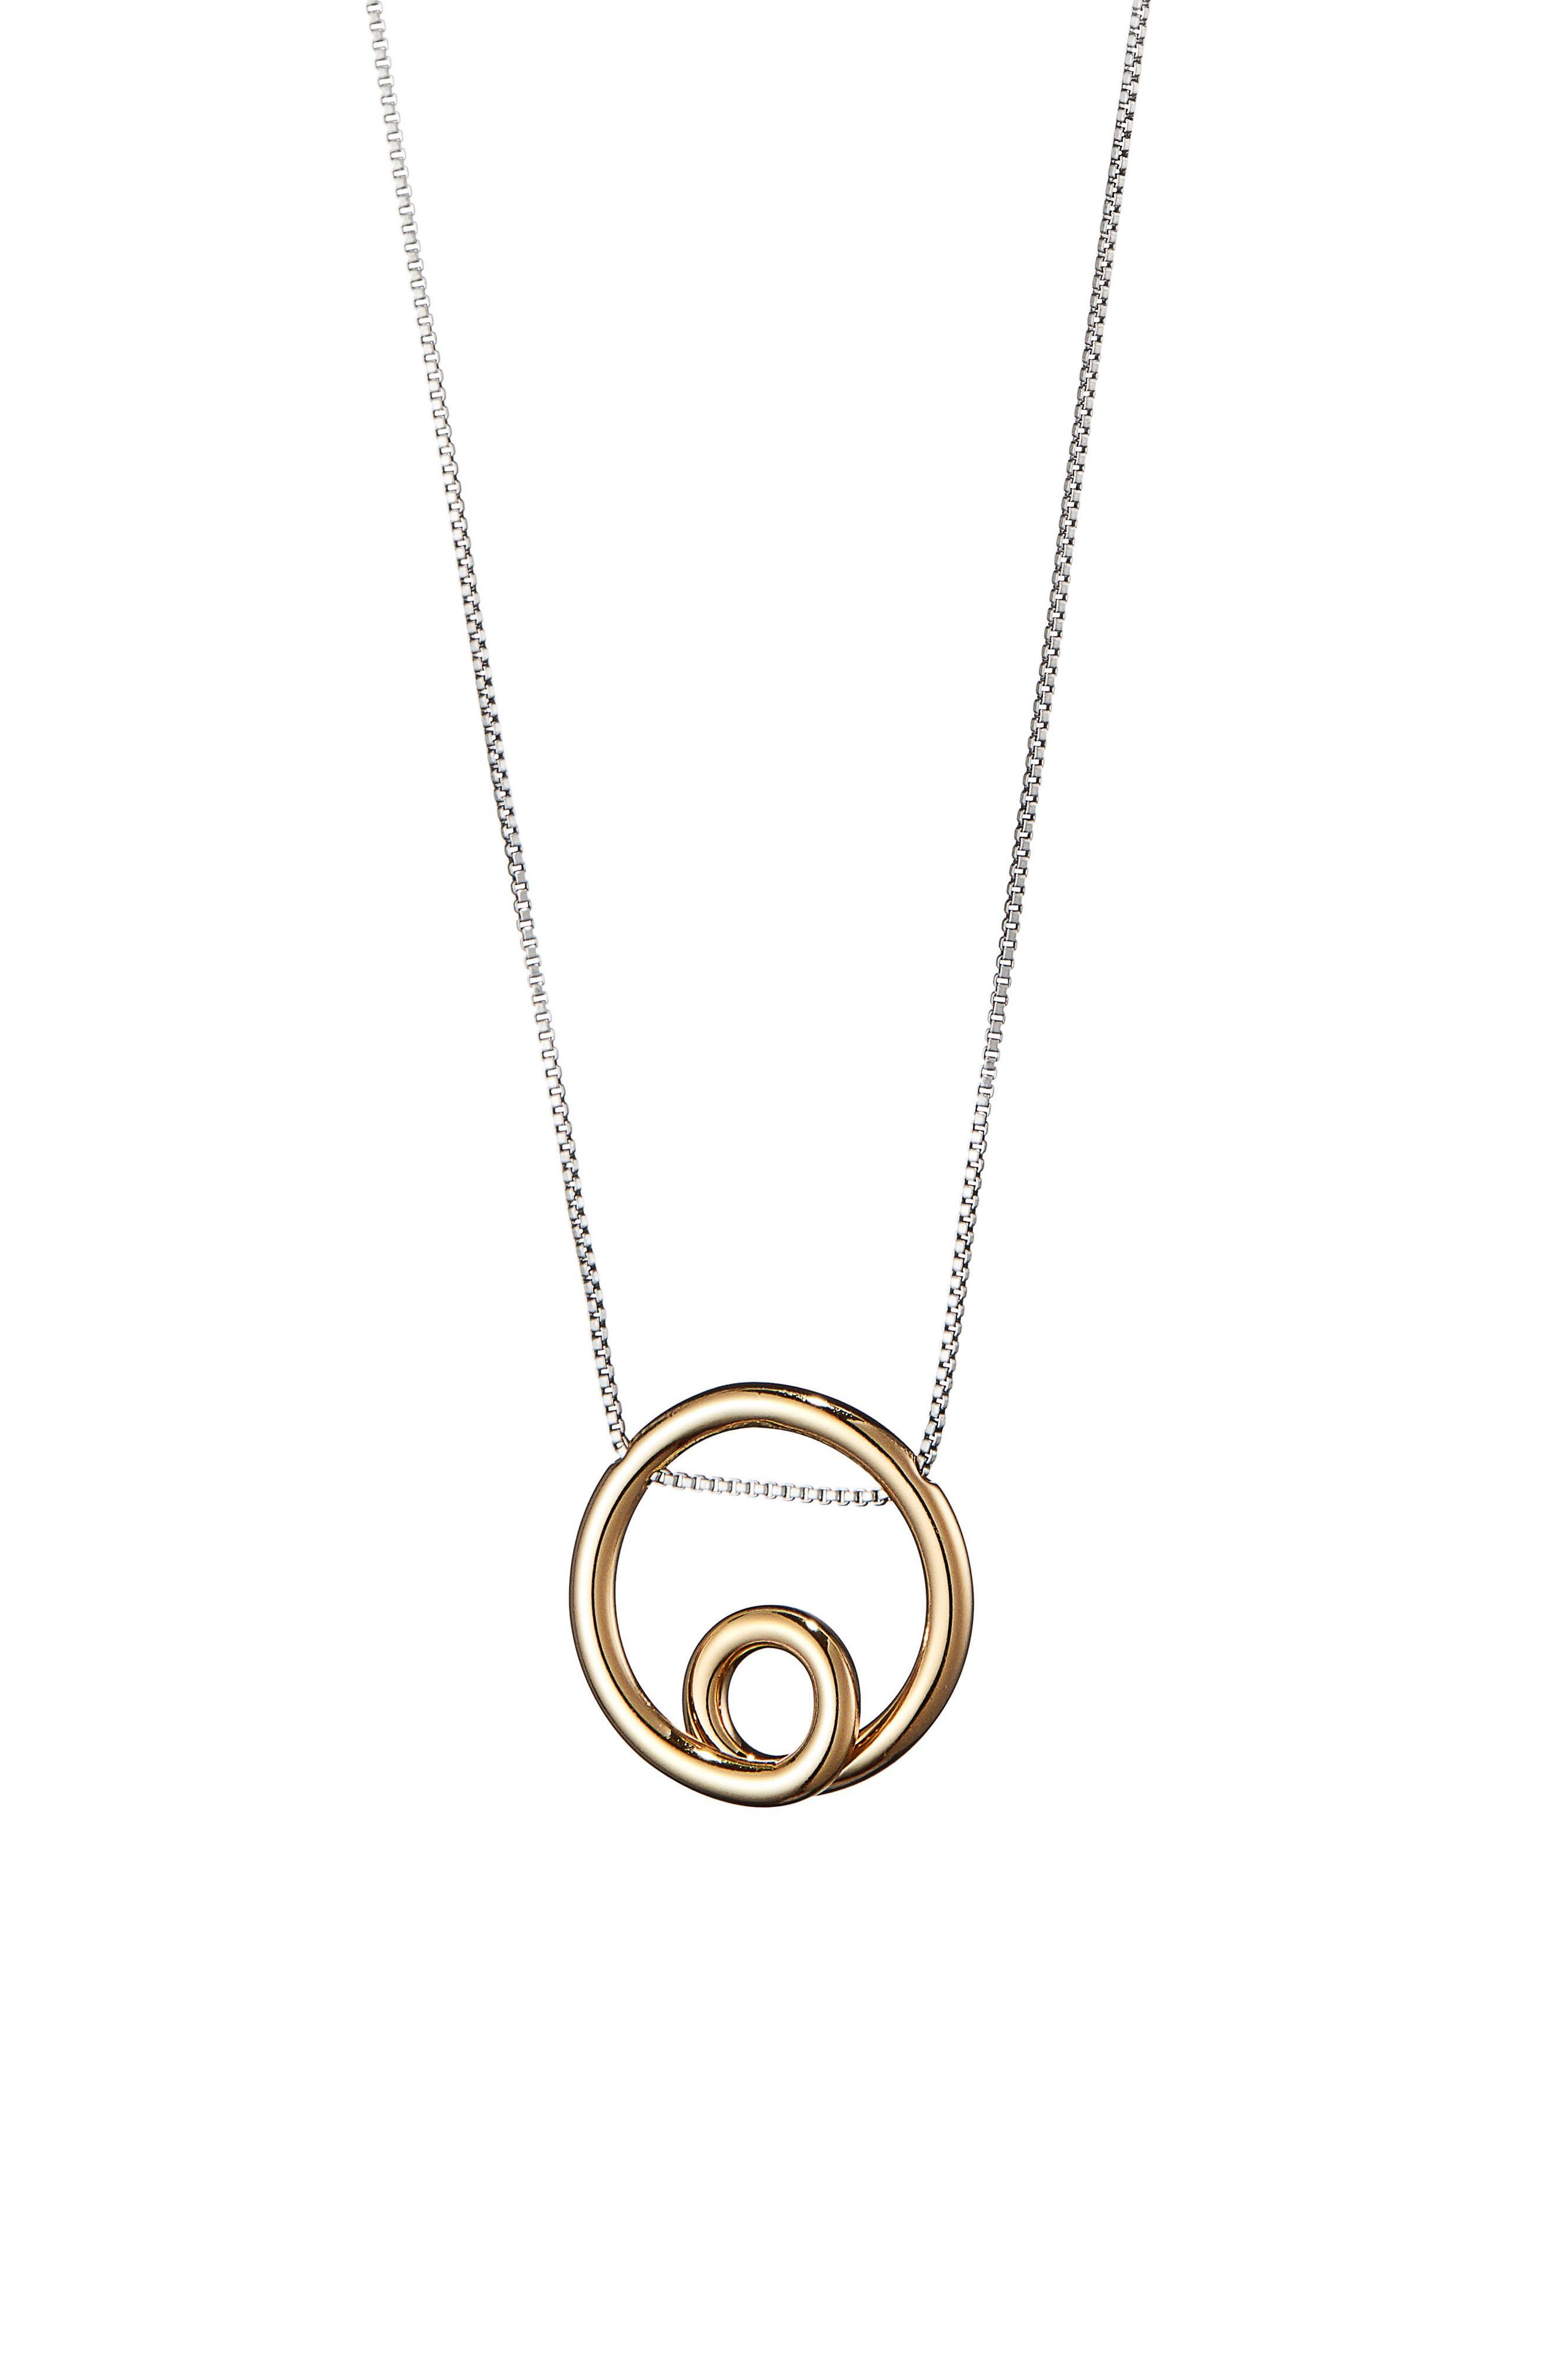 Mini Loop Pendant Necklace,                             Main thumbnail 1, color,                             710